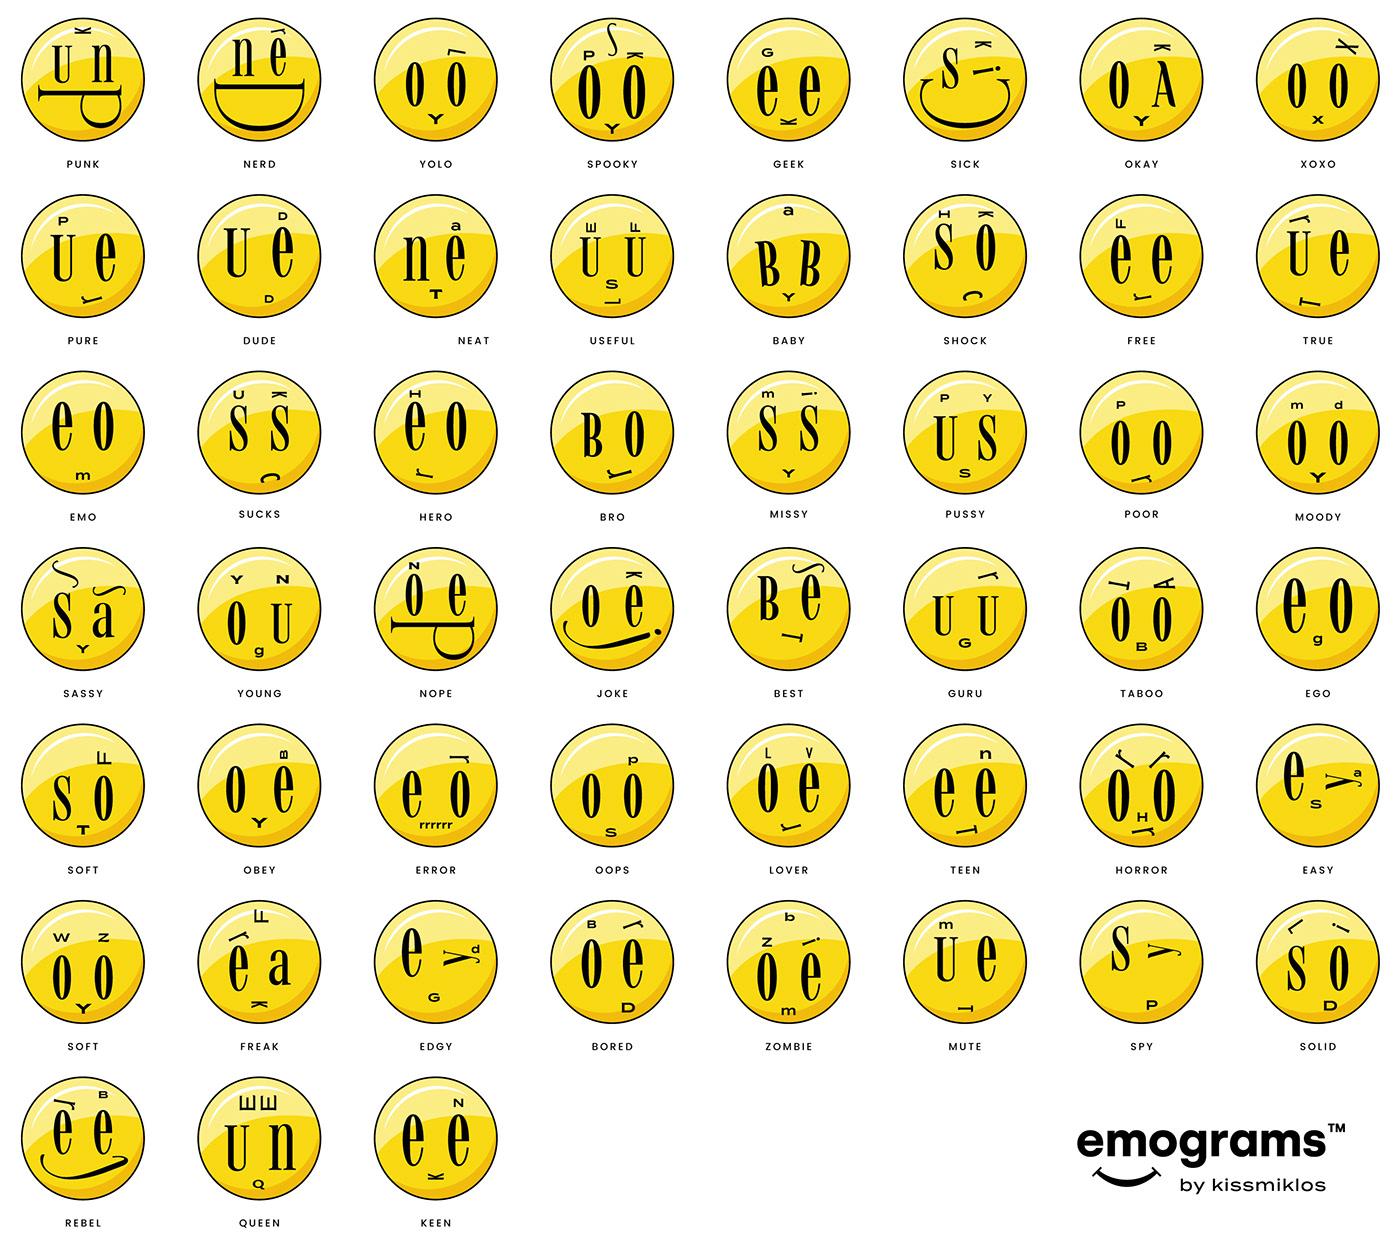 ball installation emogram emograms Exhibition  installation Installation Art Pop Art Street Art  urban art yellow installation